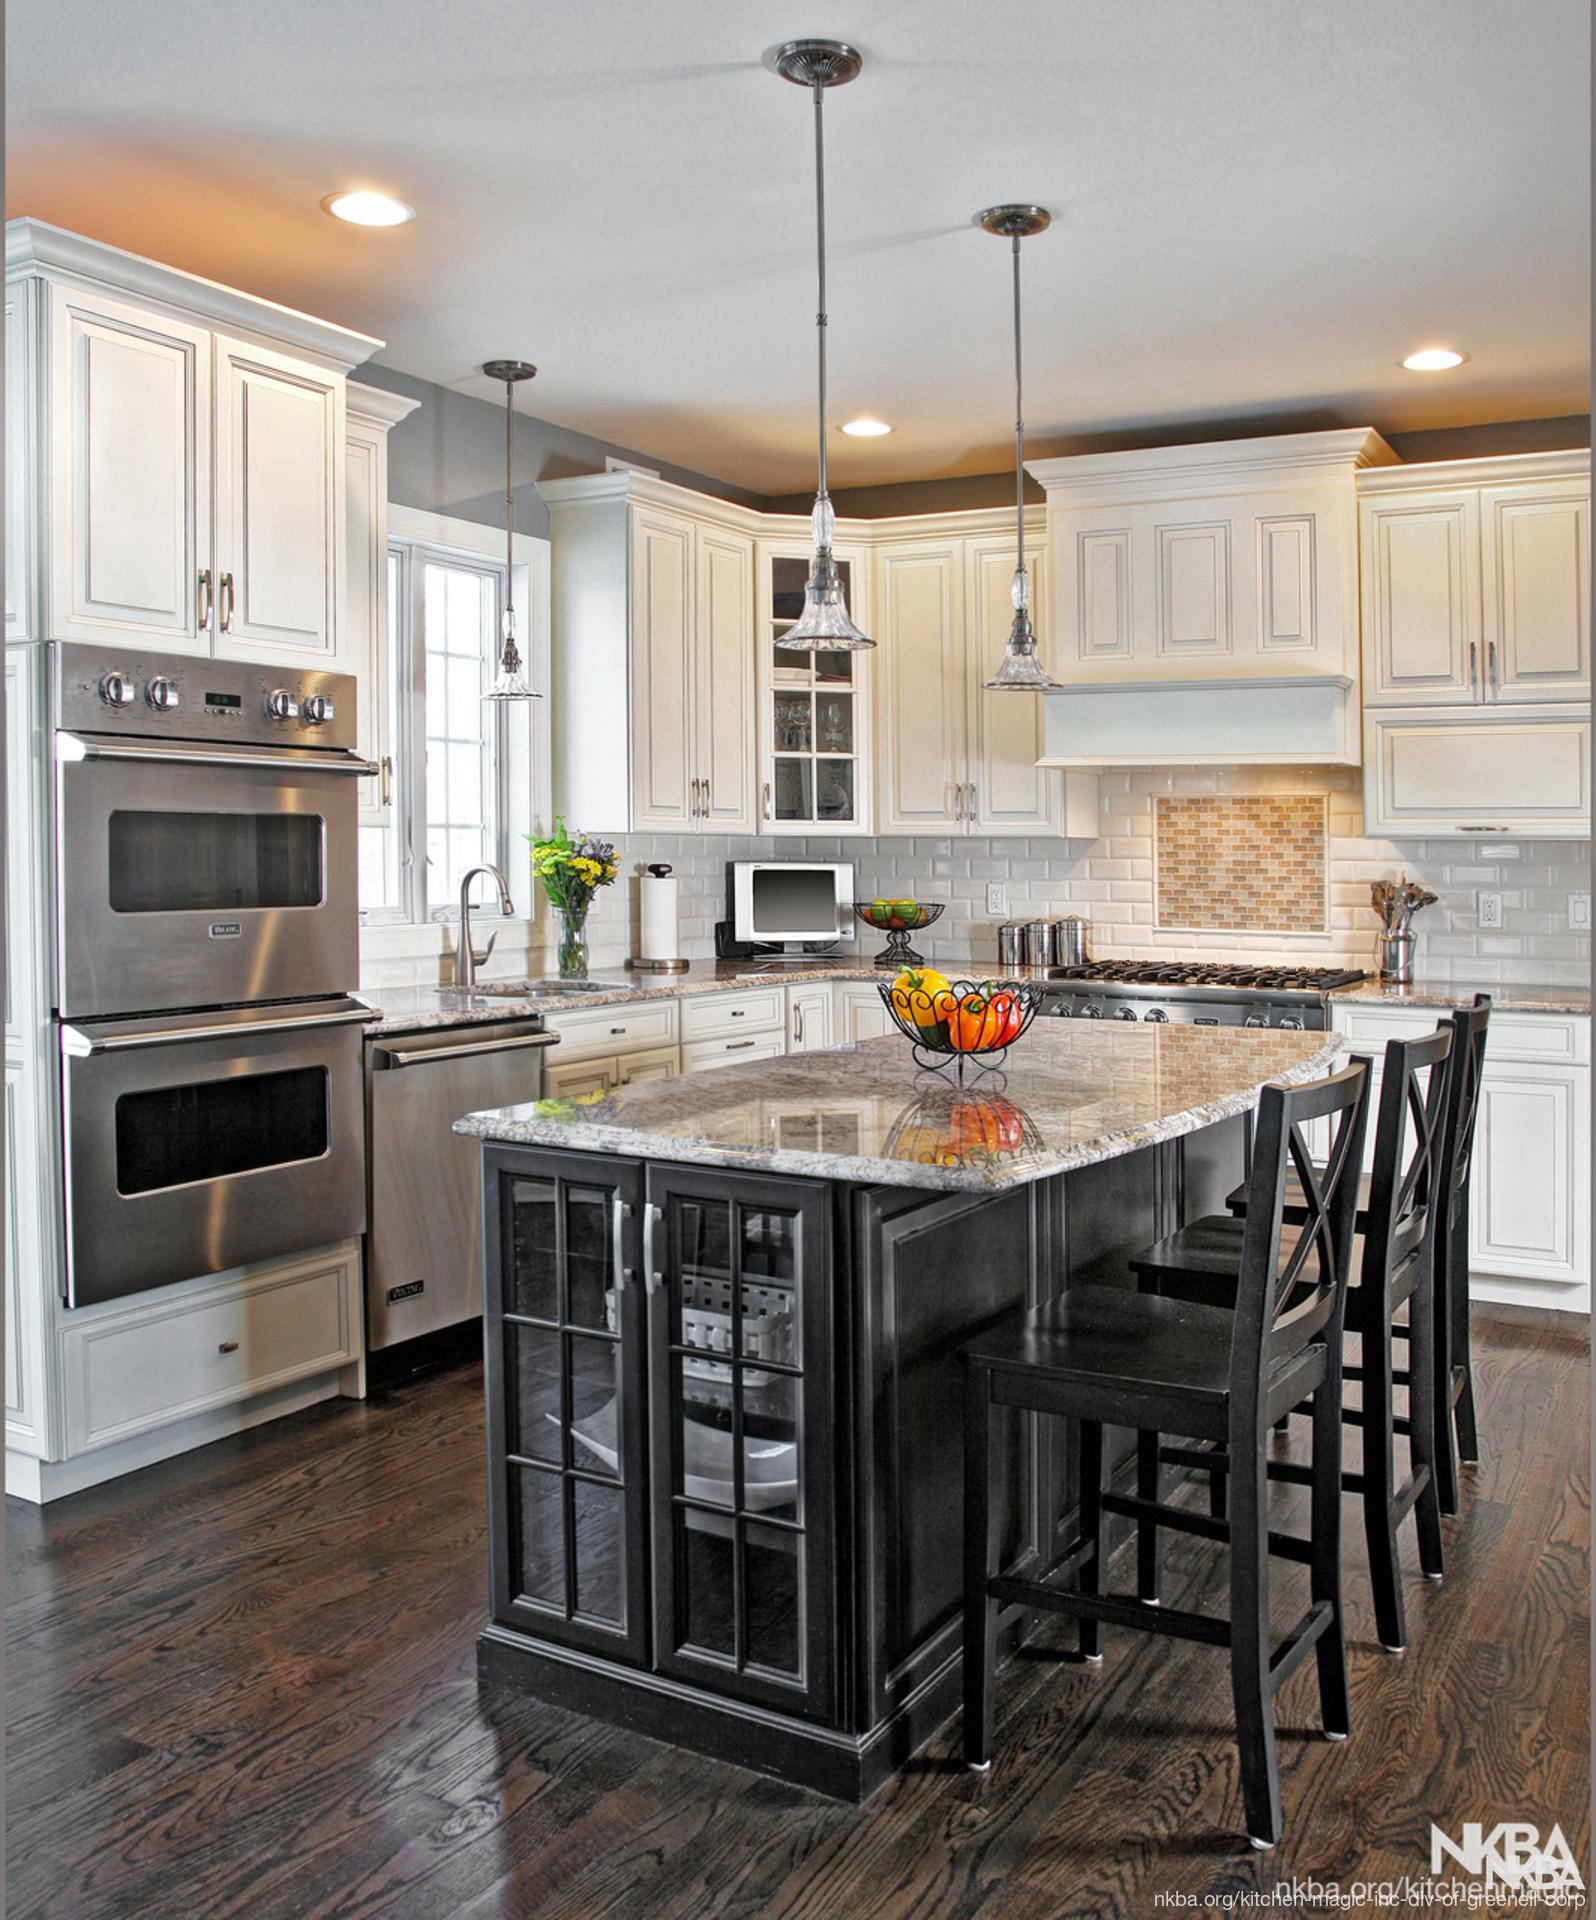 Antique White Kitchen: Ebony Black Island Surrounds By Antique White Cabinets